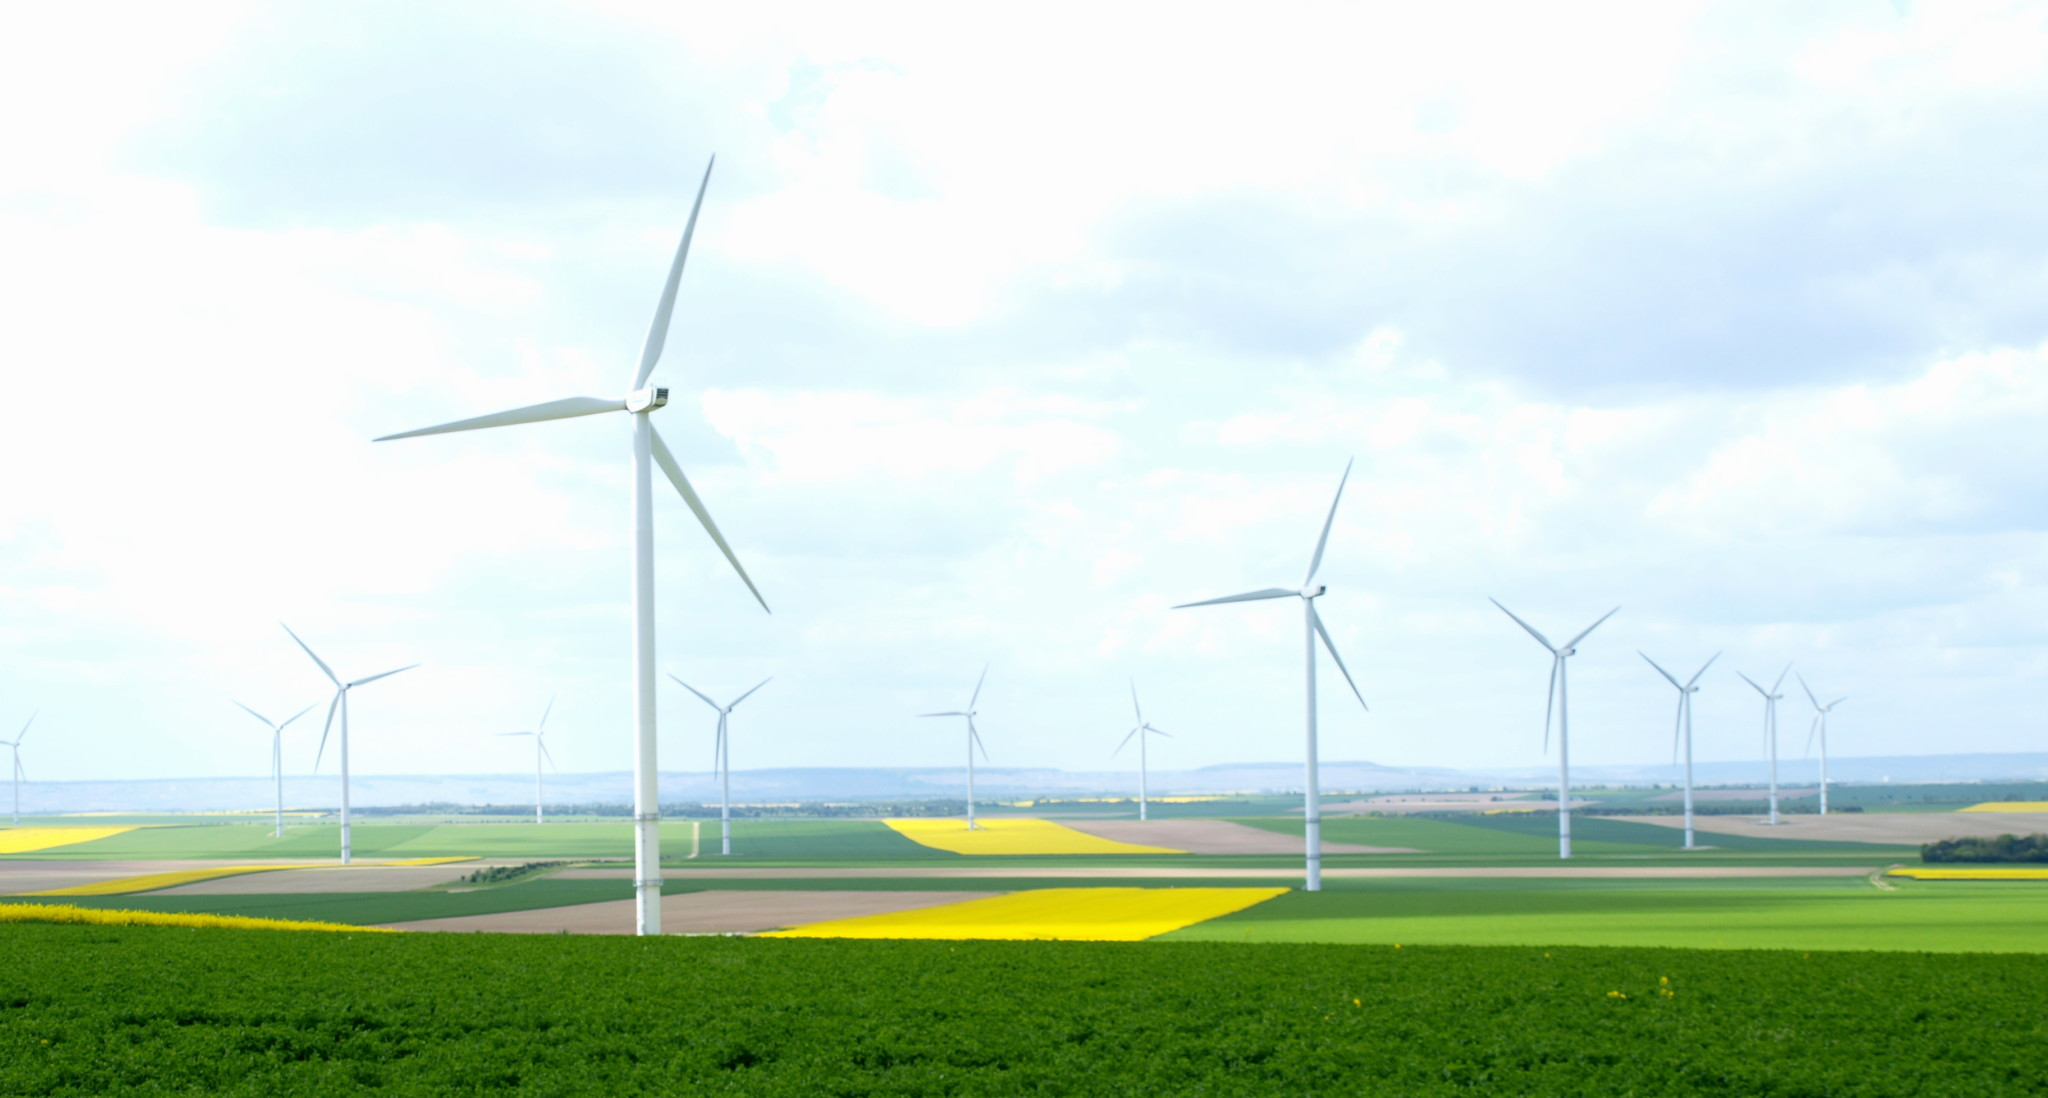 barbara pompili presente mesures ameliorer acceptabilite eolien france - L'Energeek